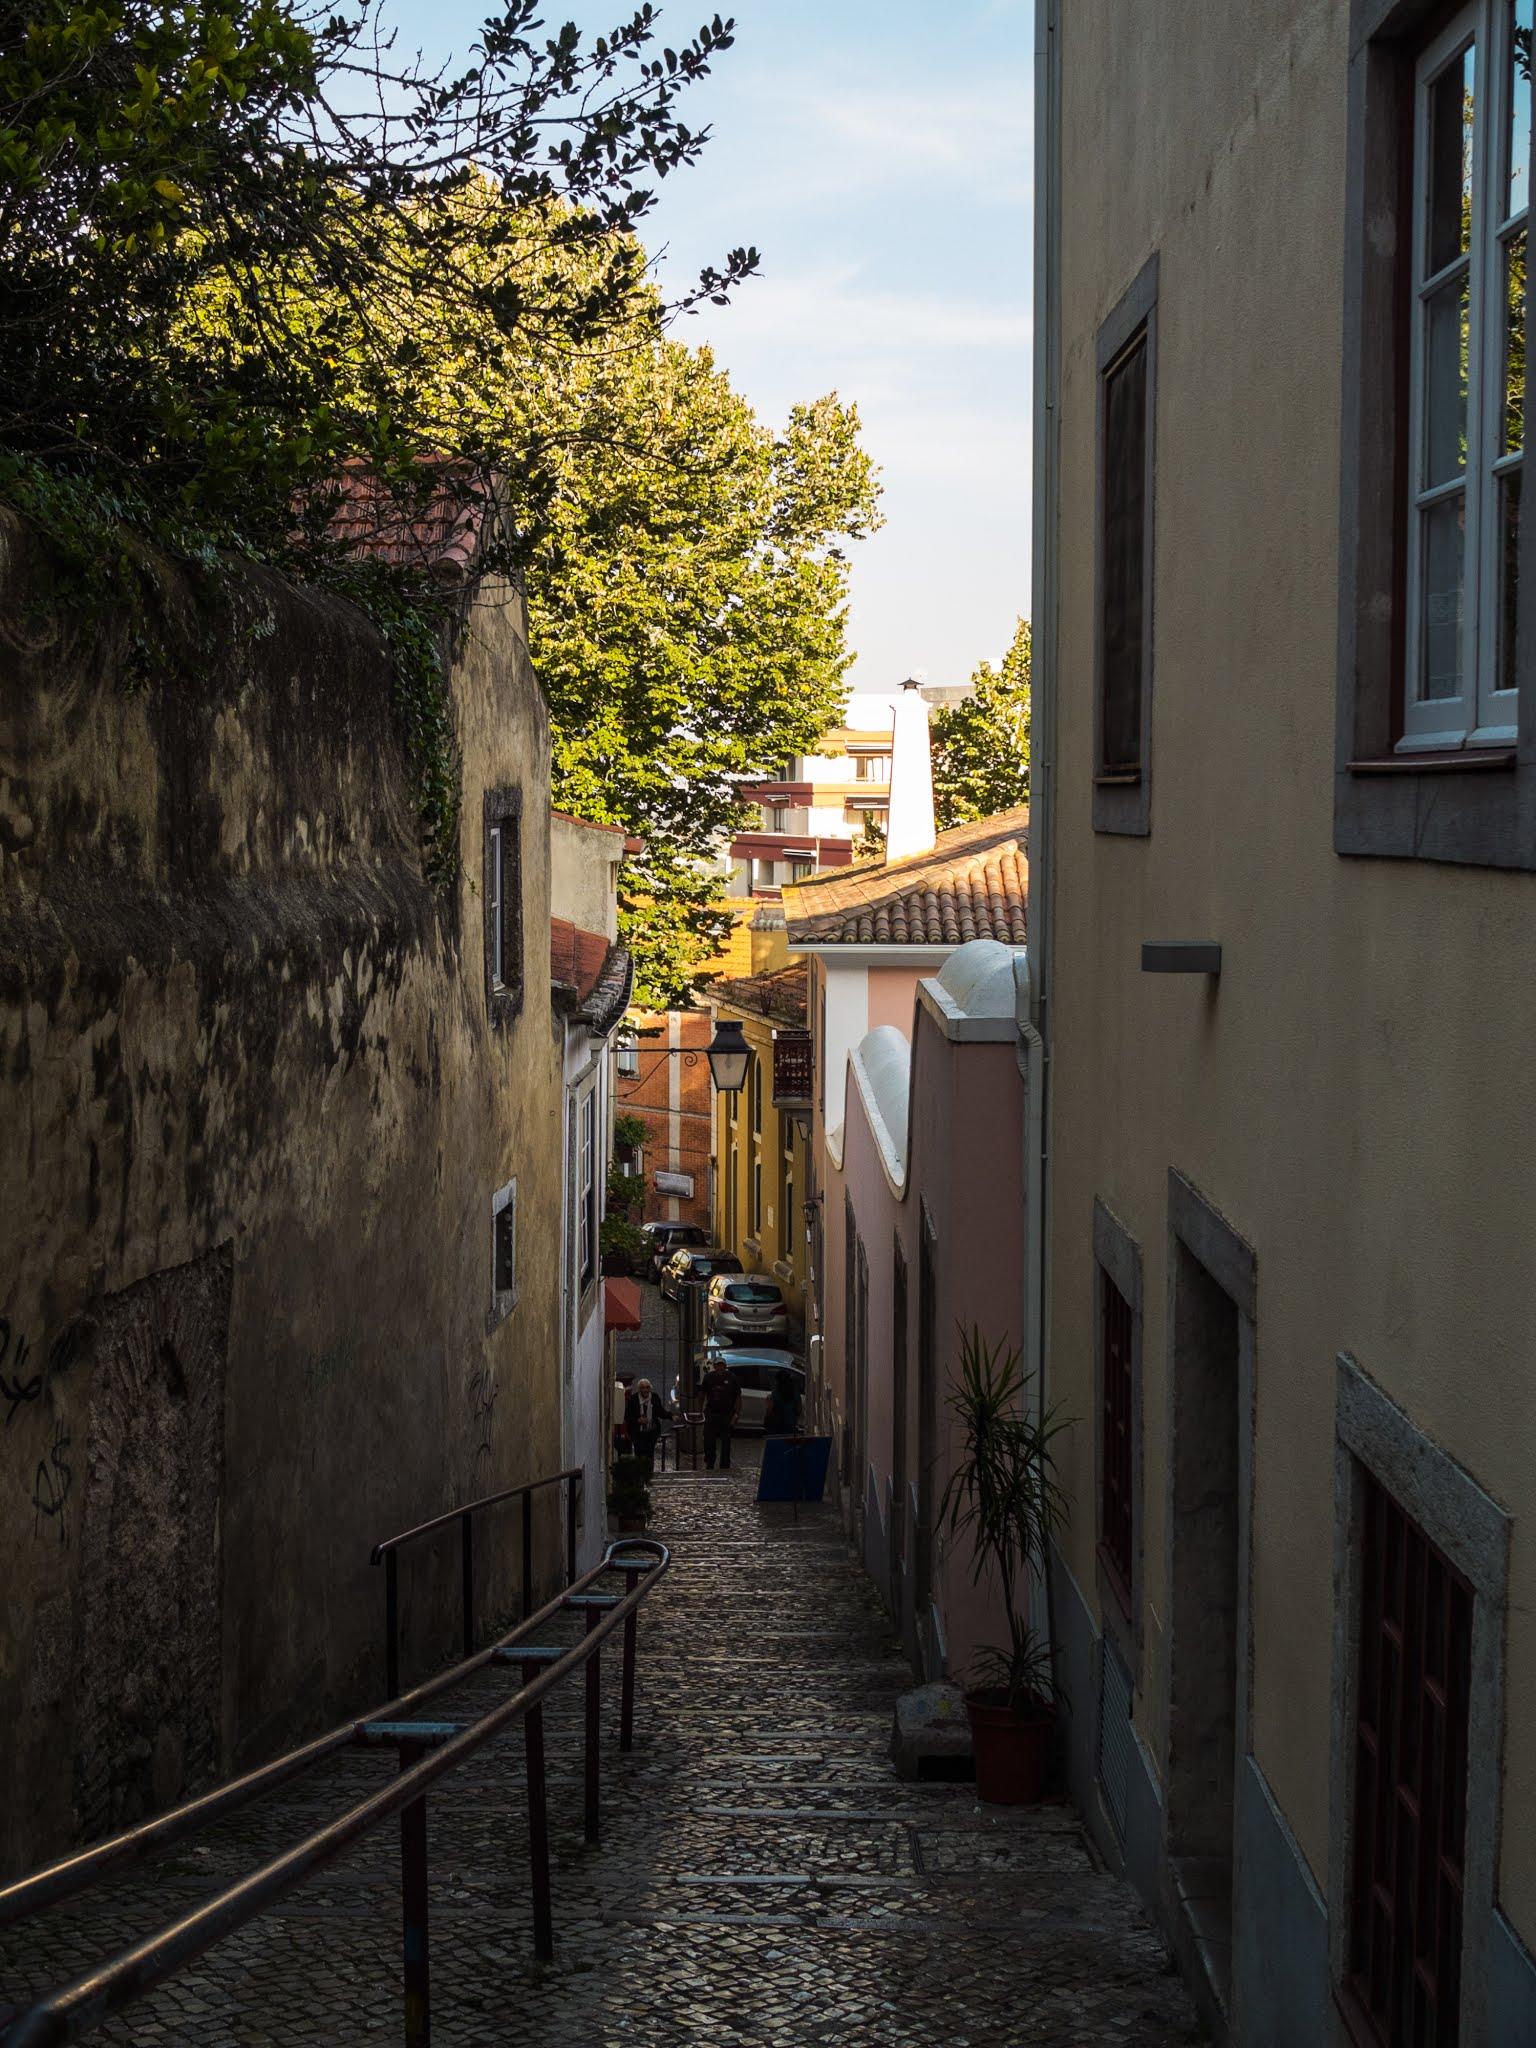 Walking downhill a narrow street in Sintra, Portugal.